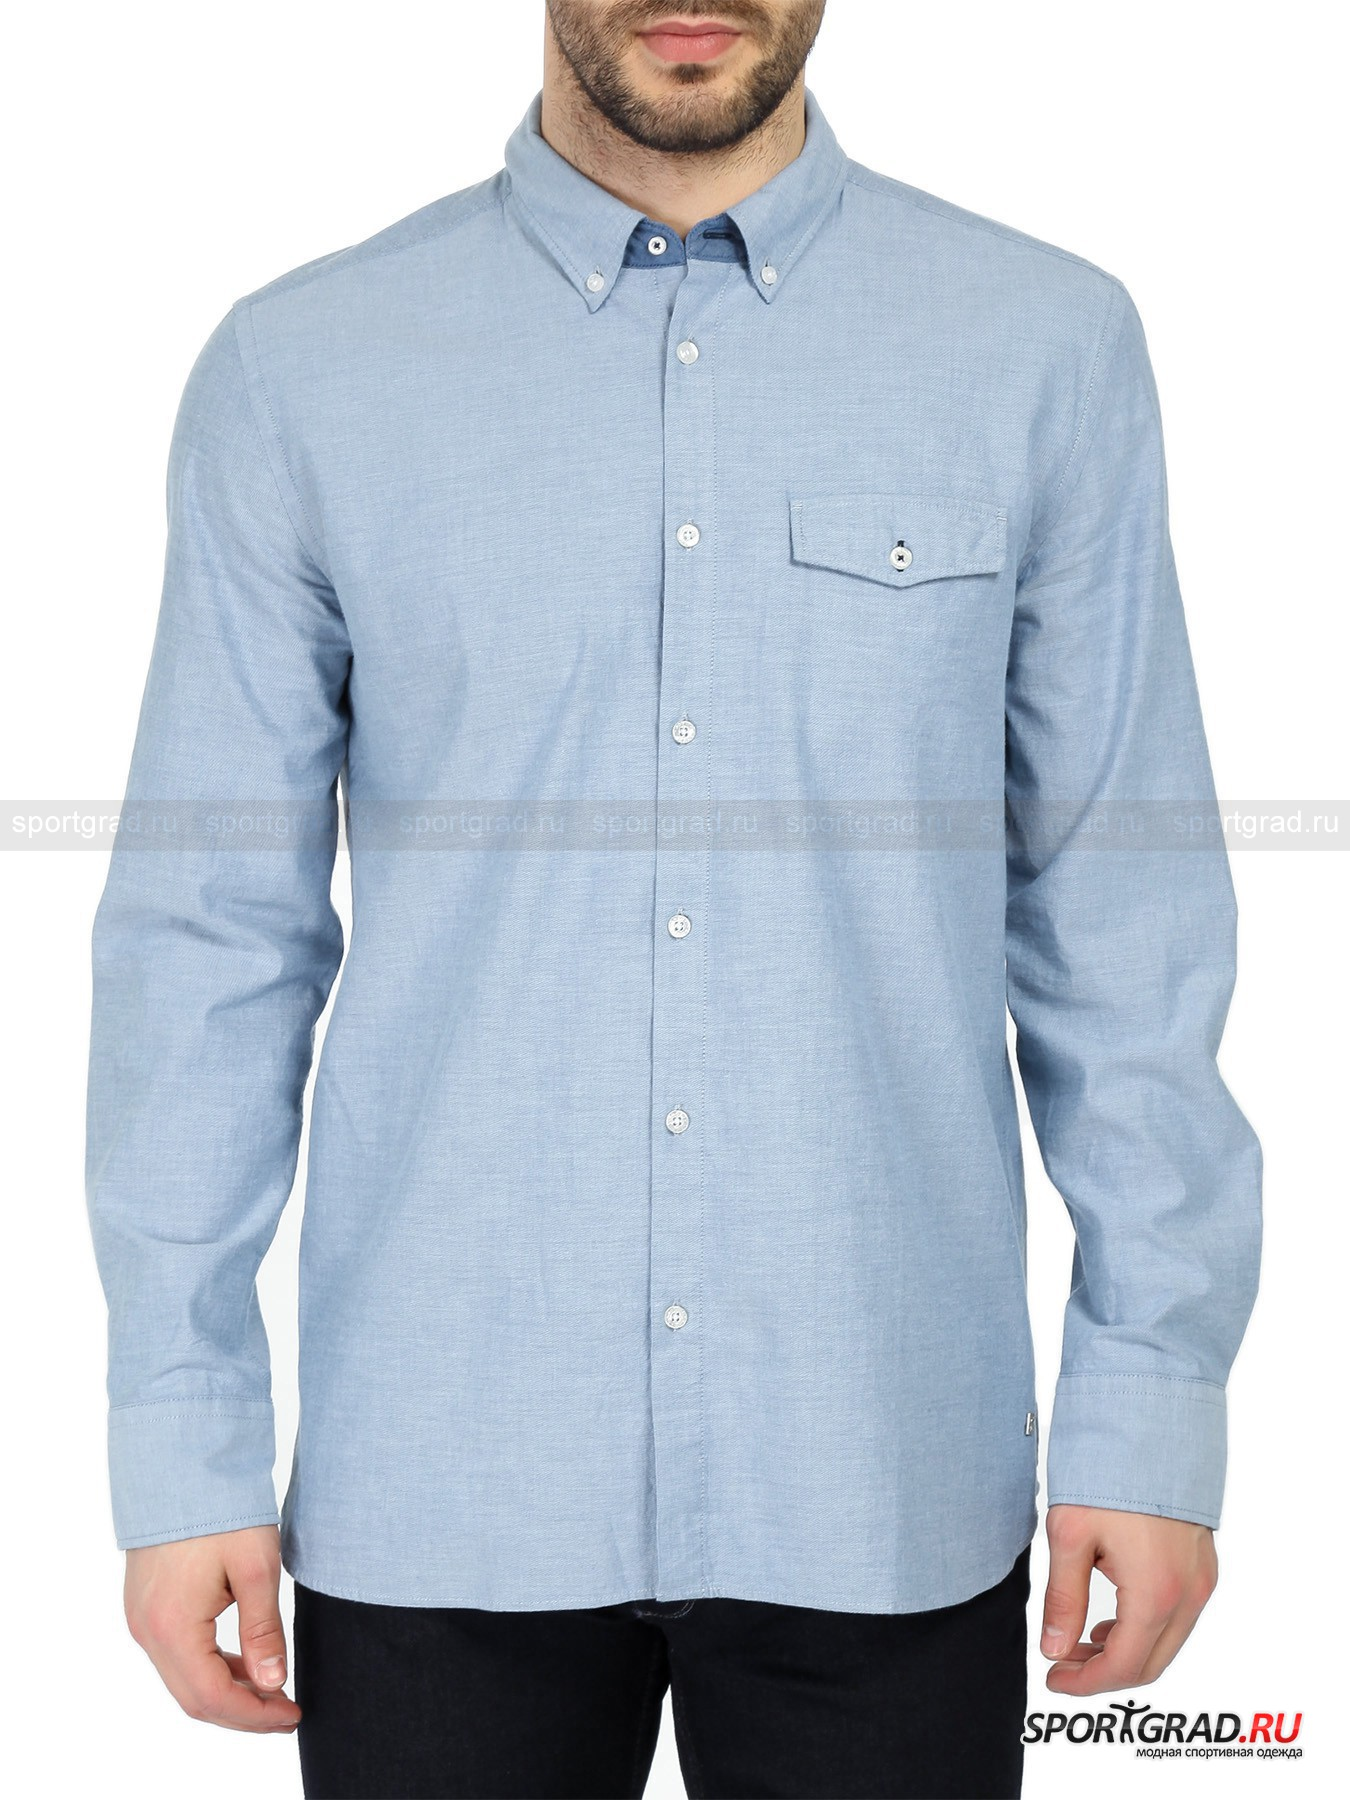 ������� ������� Pitpoint Shirt BOGNER JEANS